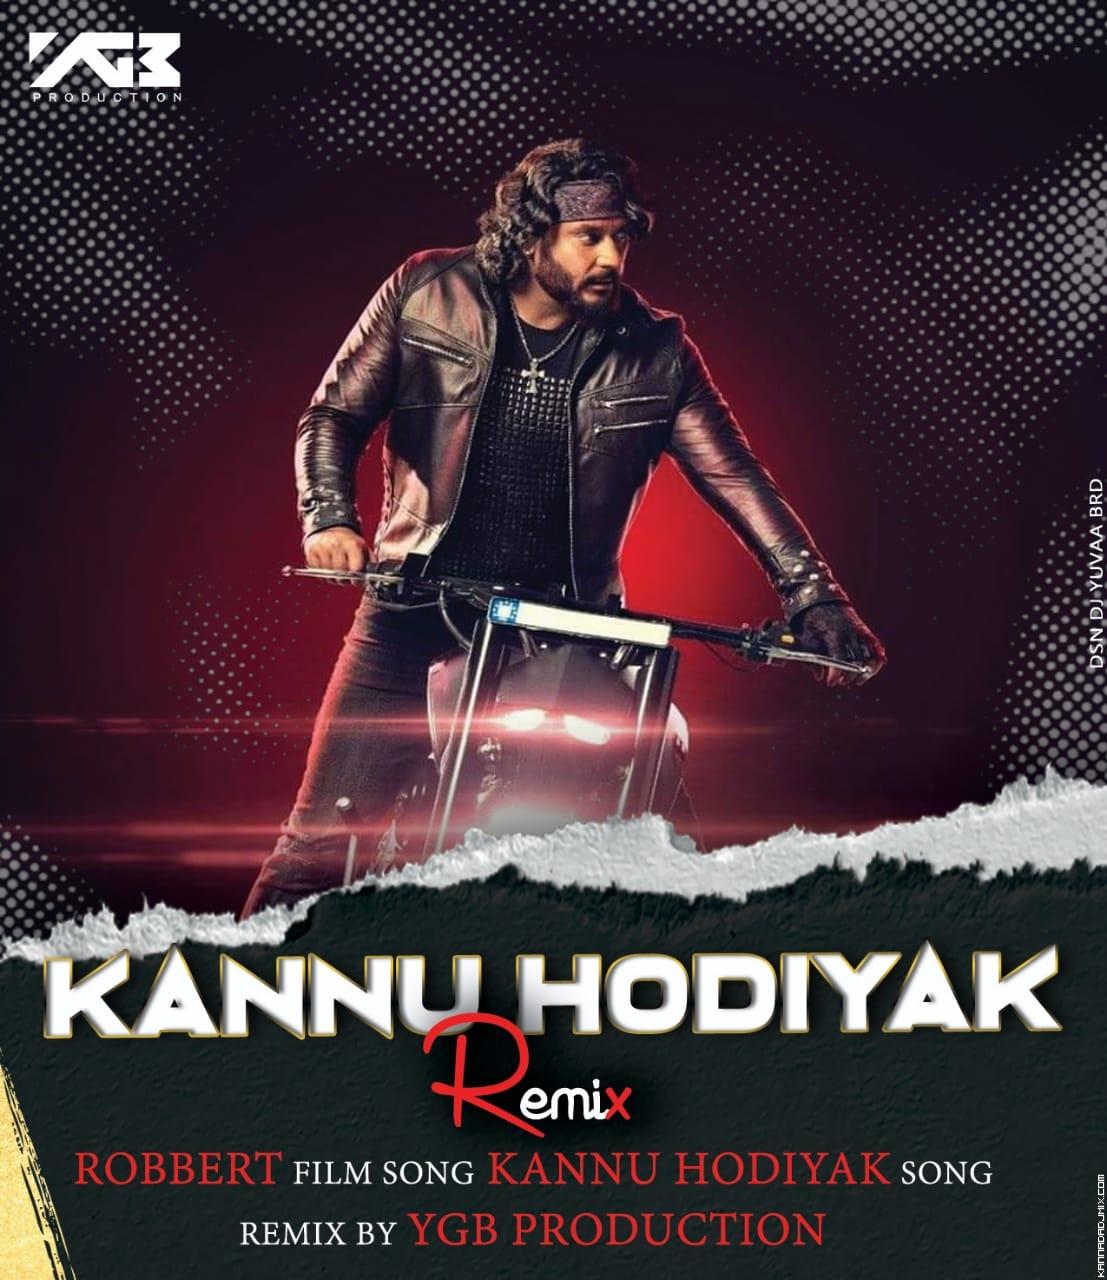 KANNU HODIYAK DJ SONG YGB PRODUCTION.mp3